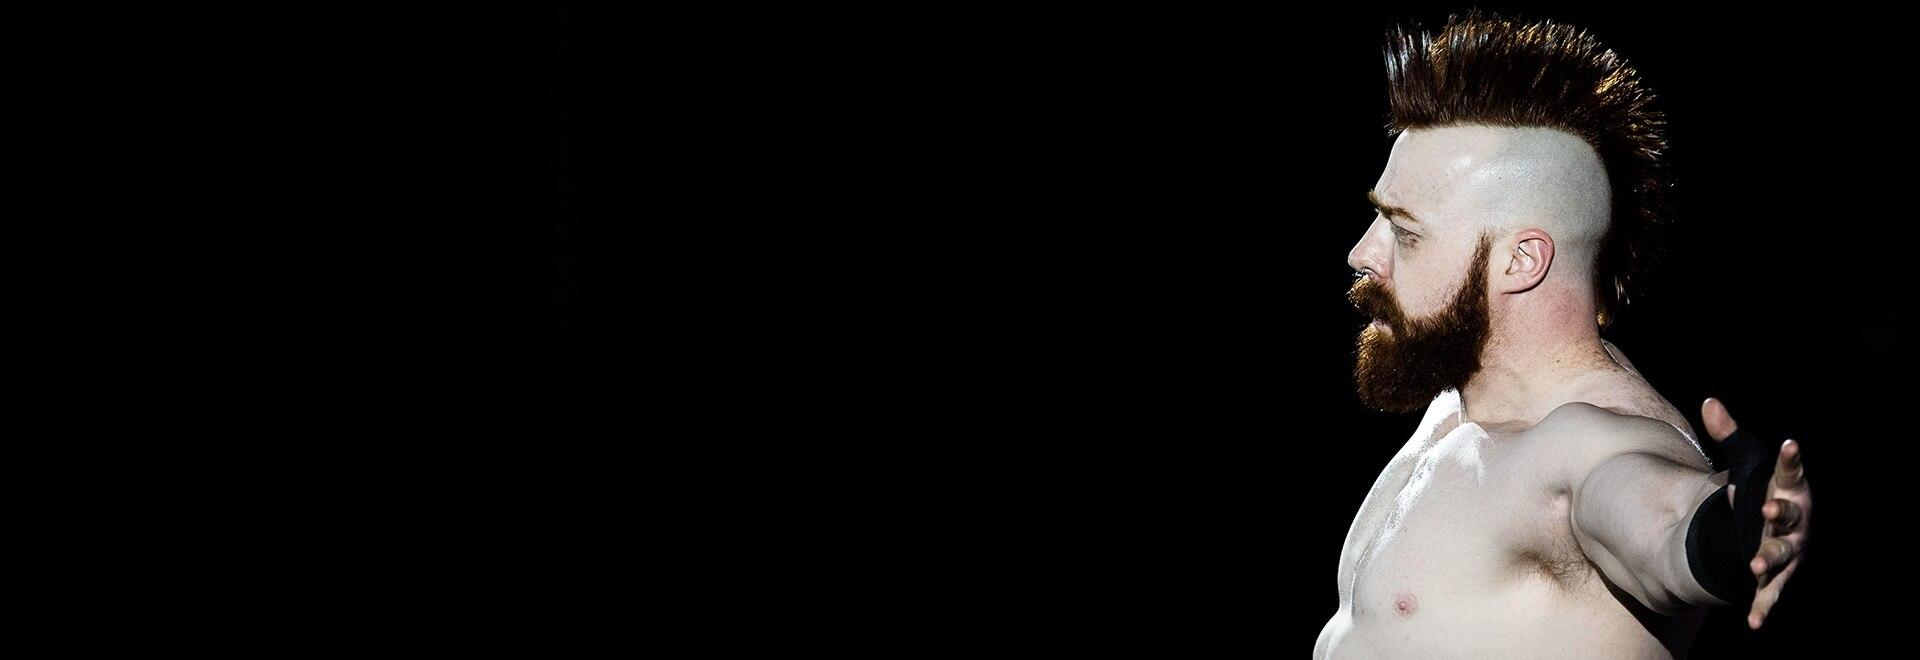 Ep. 33